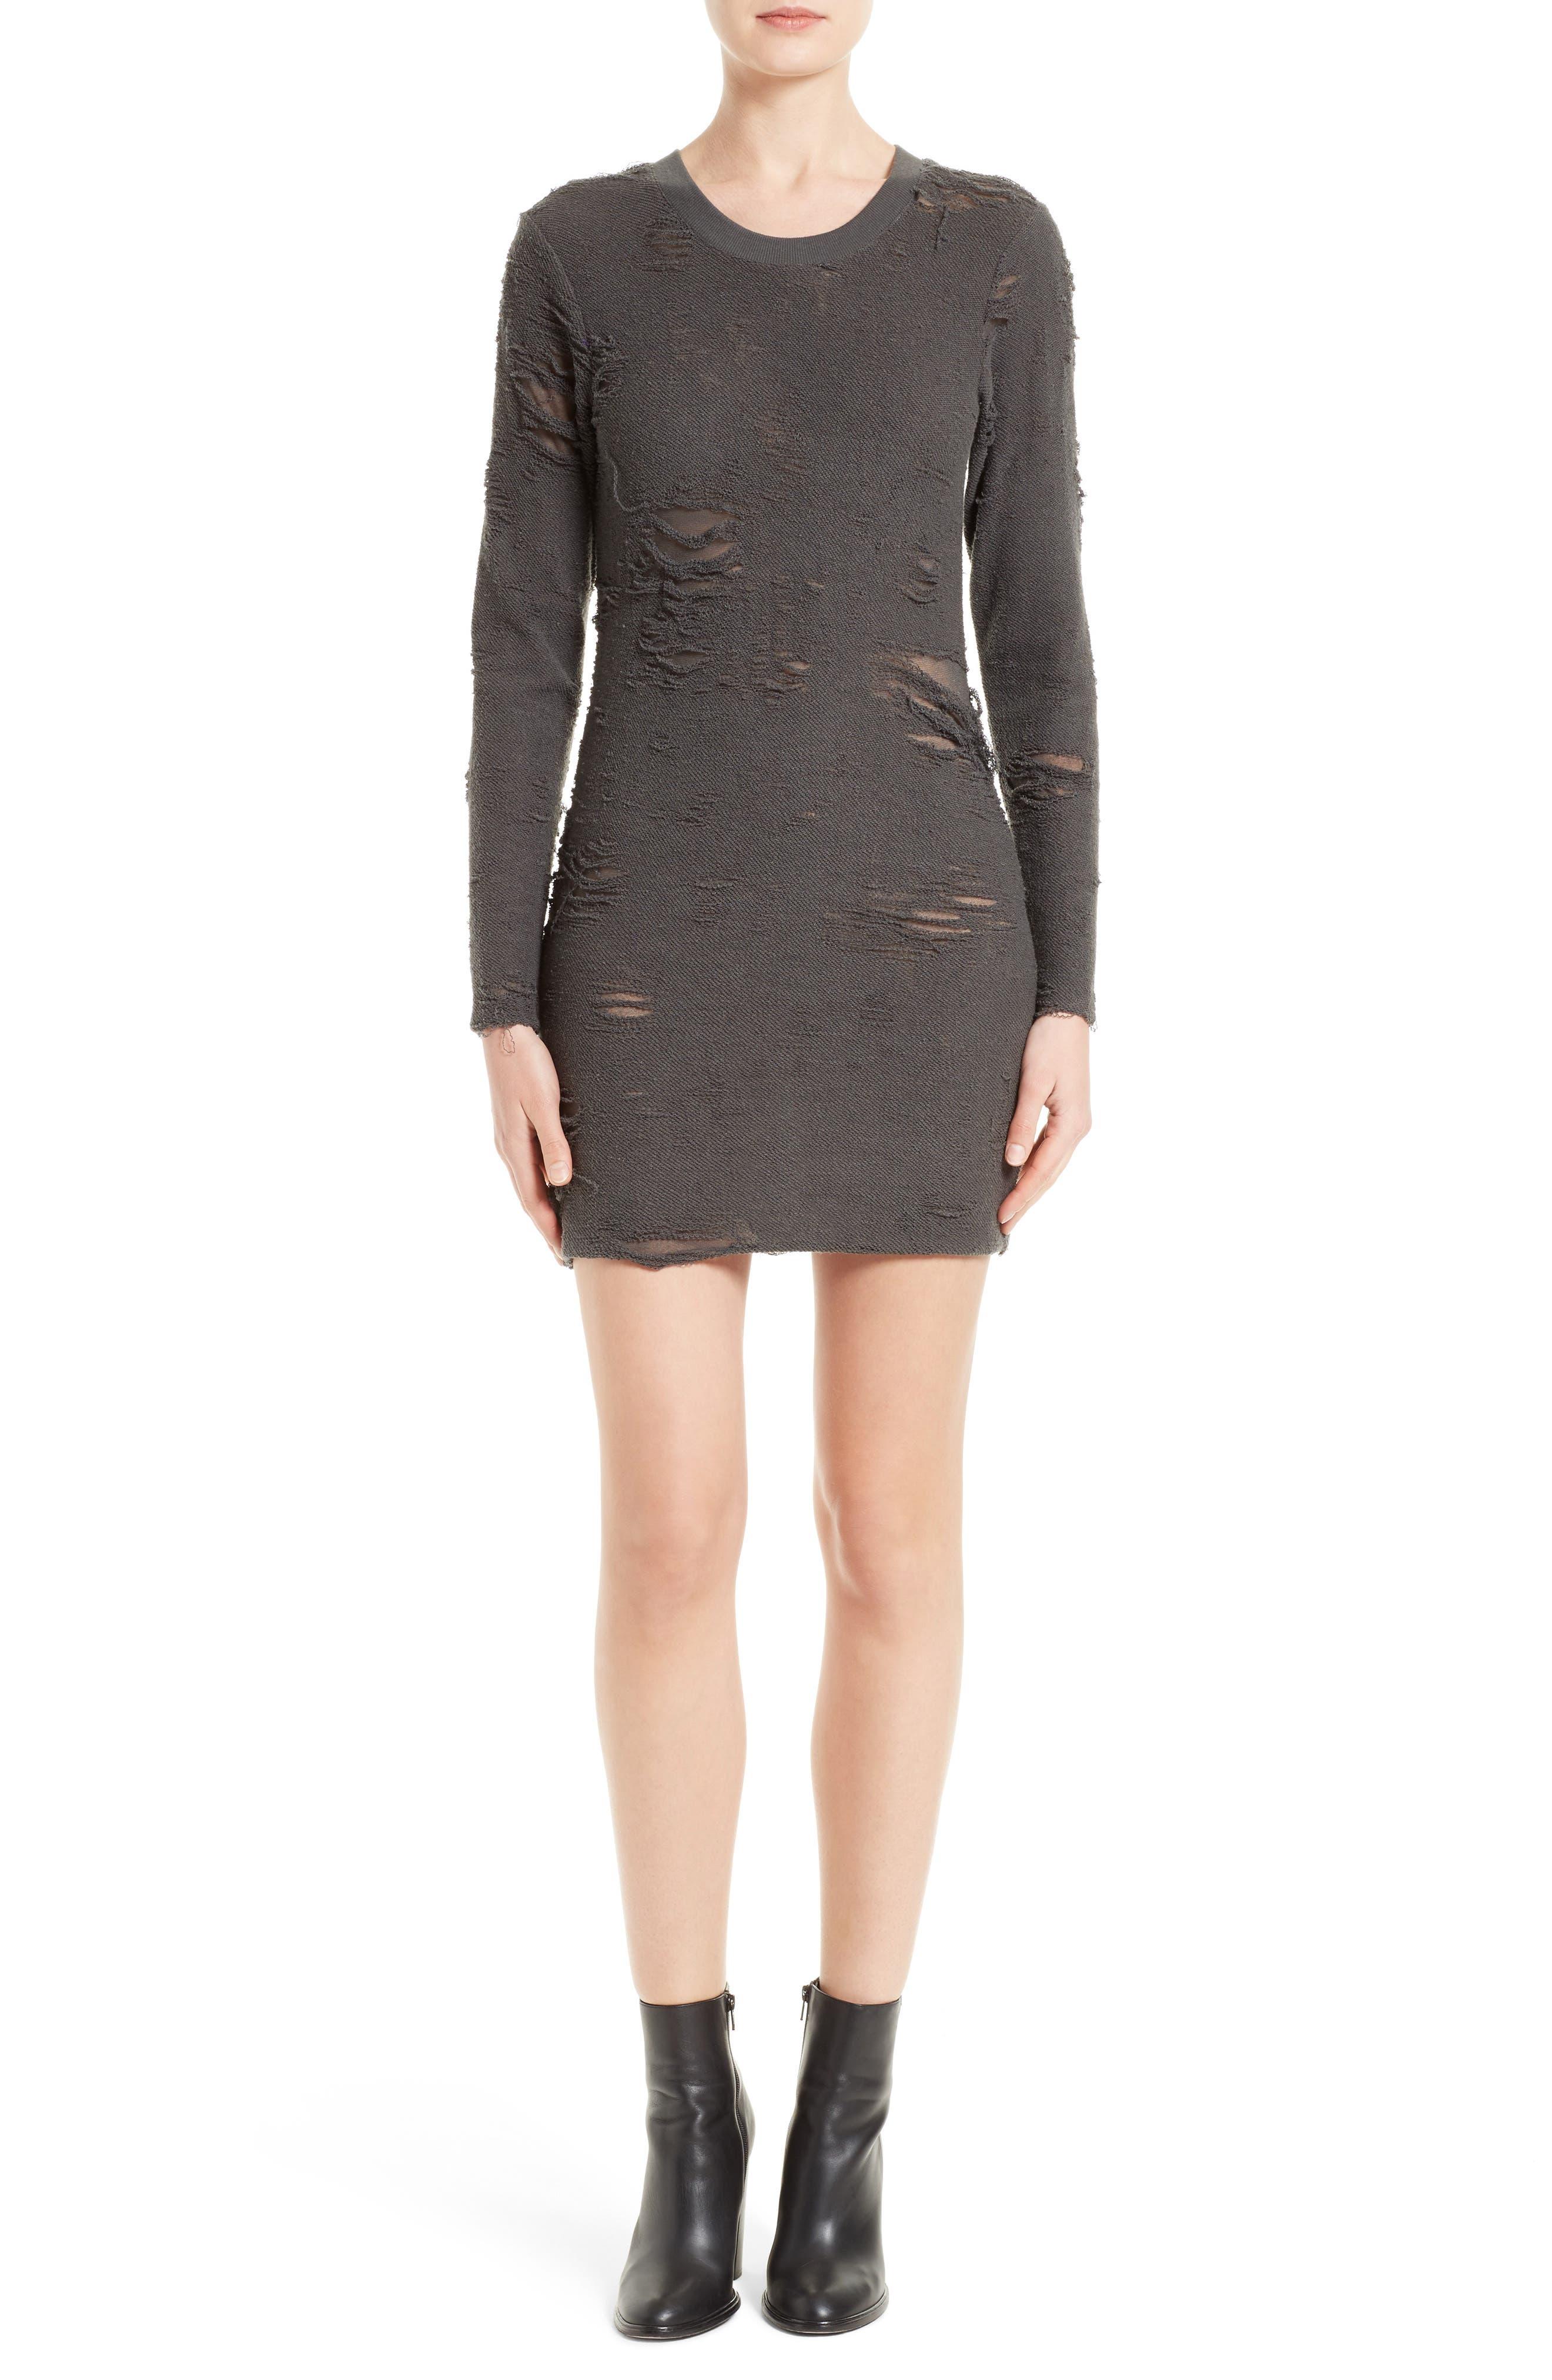 Cevoc Distressed Dress,                         Main,                         color, Anthracite